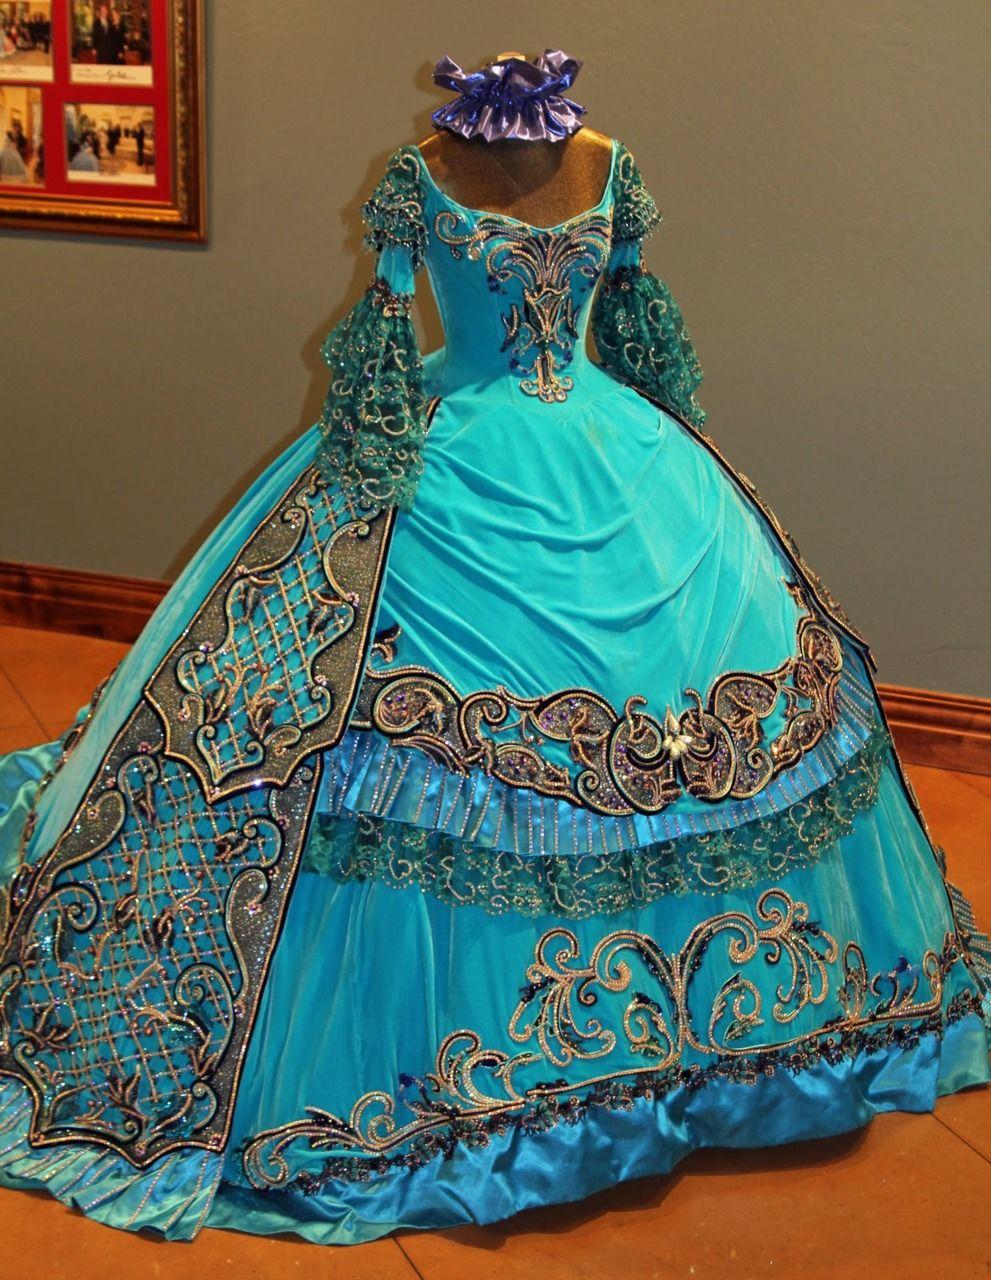 Beautiful costume ball gown wedding dress ドレス 夜会服 robe платье